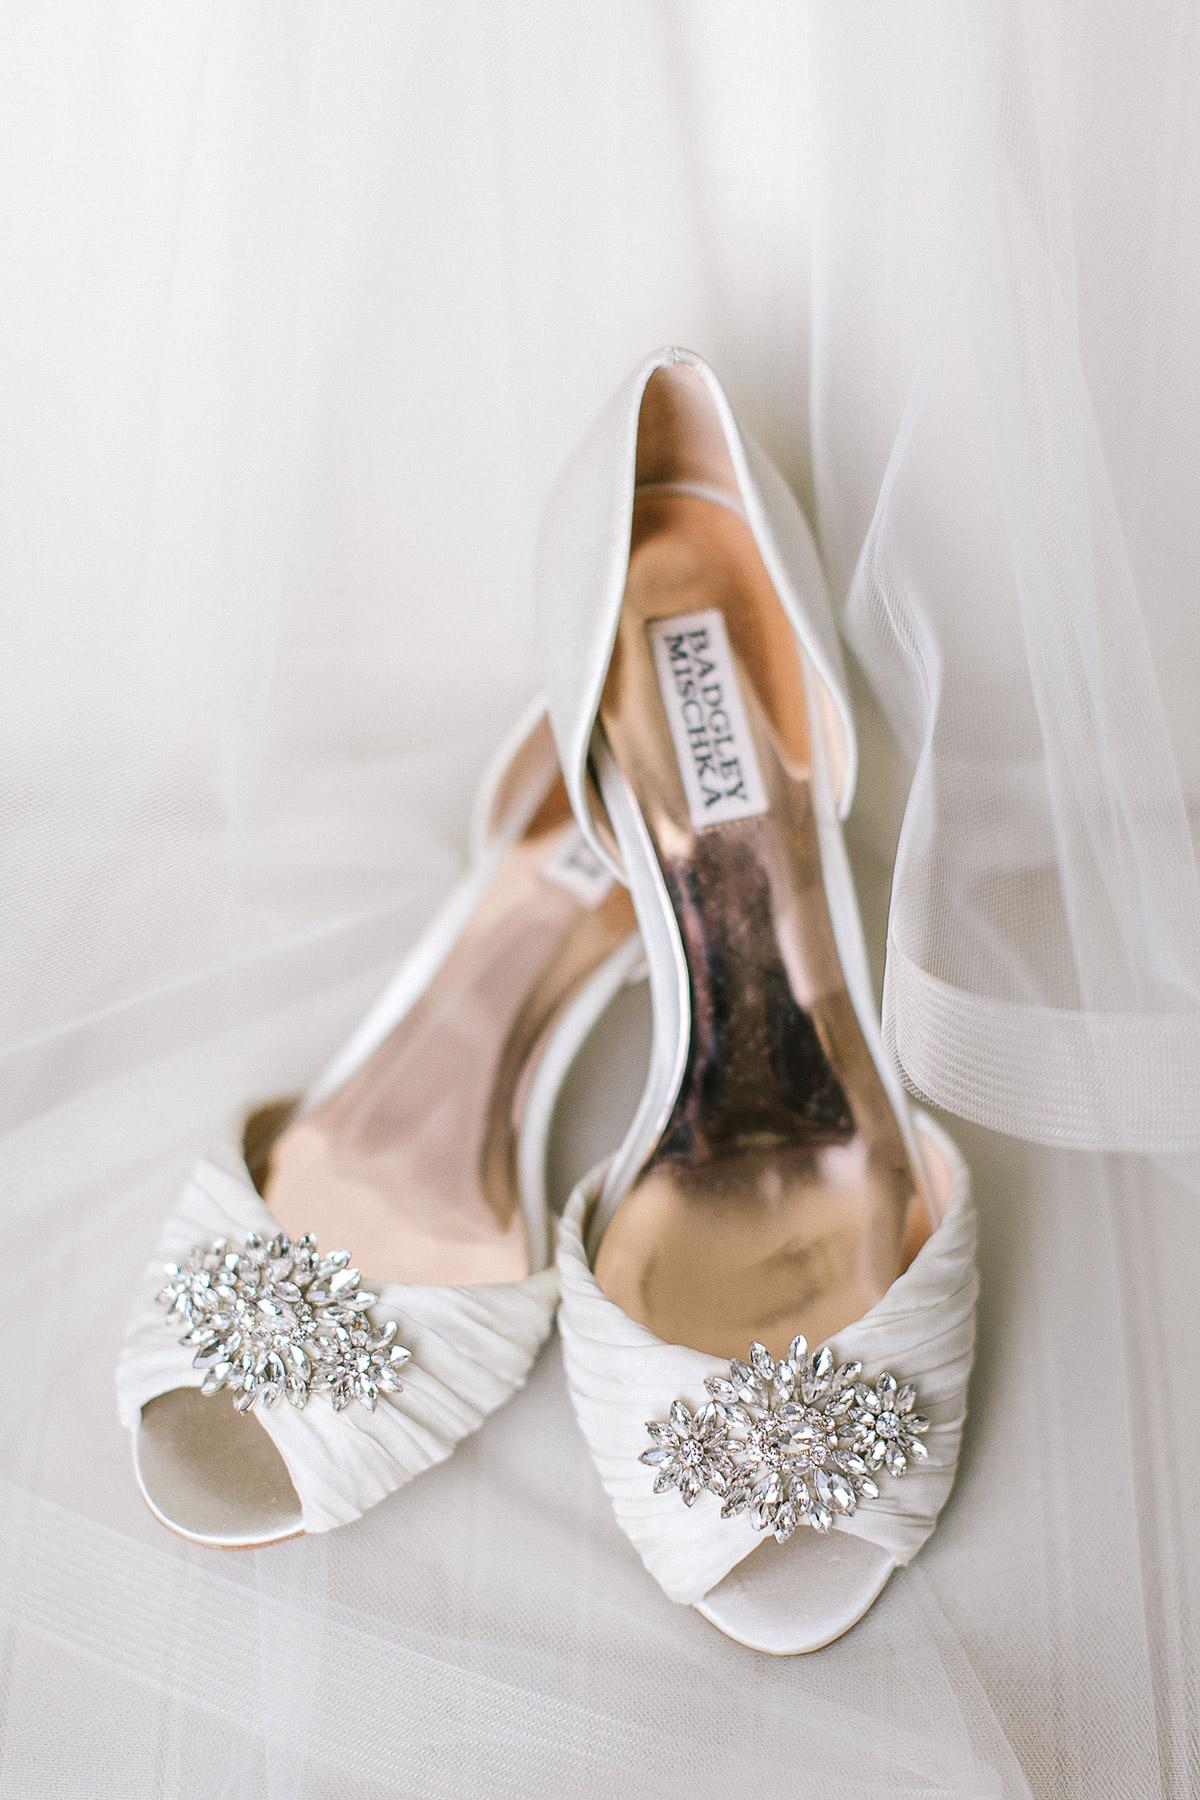 tamara-lockwood-photography-vineyard-bride-swish-list-the-old-courthouse-niagara-on-the-lake-wedding-5.jpg